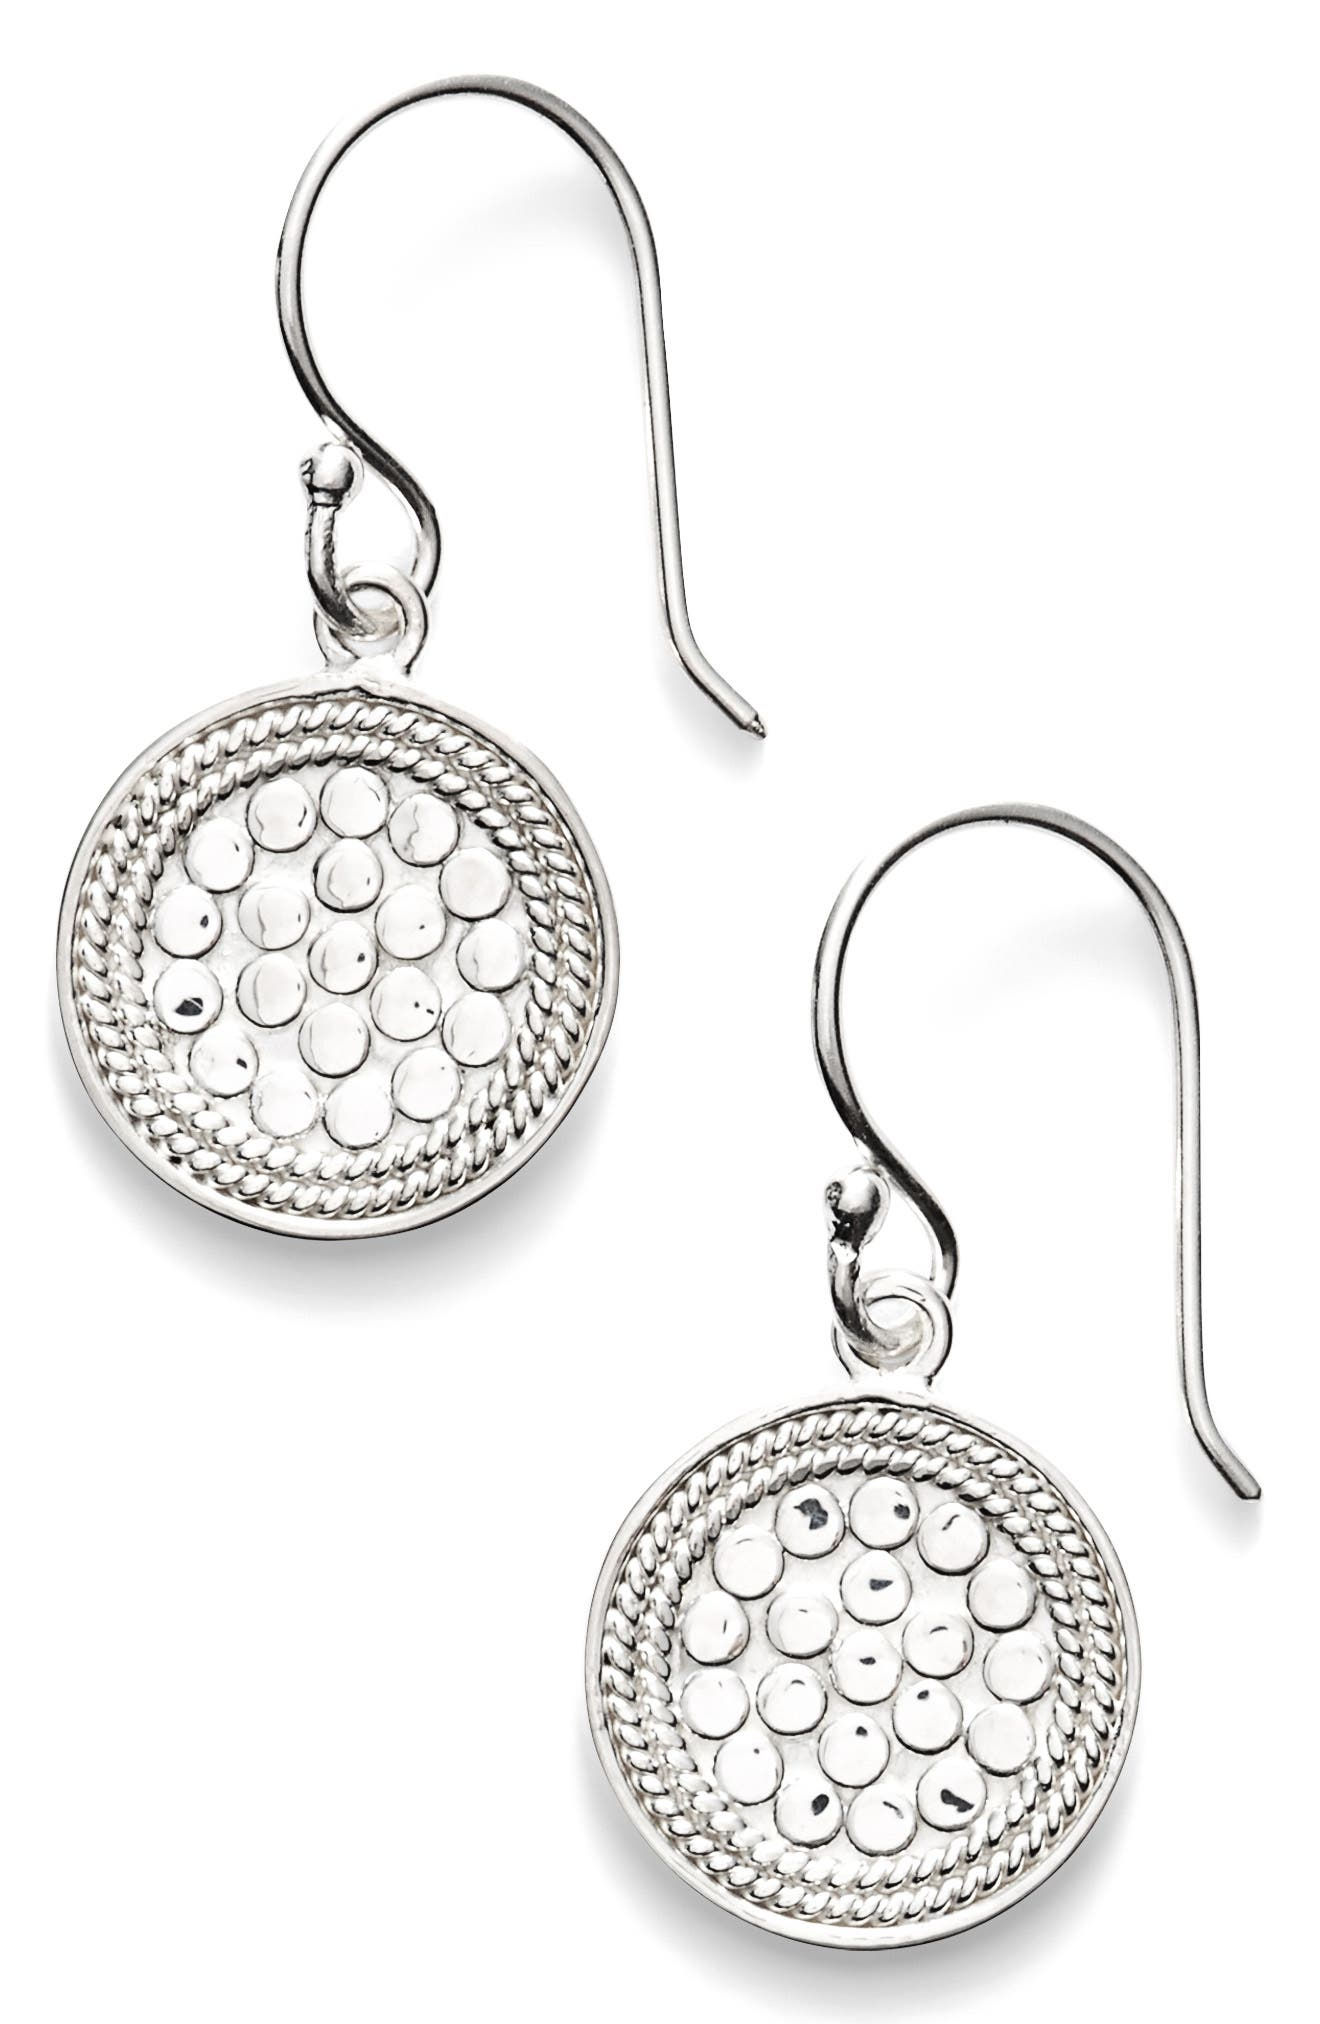 'Gili' Small Drop Earrings,                             Main thumbnail 1, color,                             SILVER